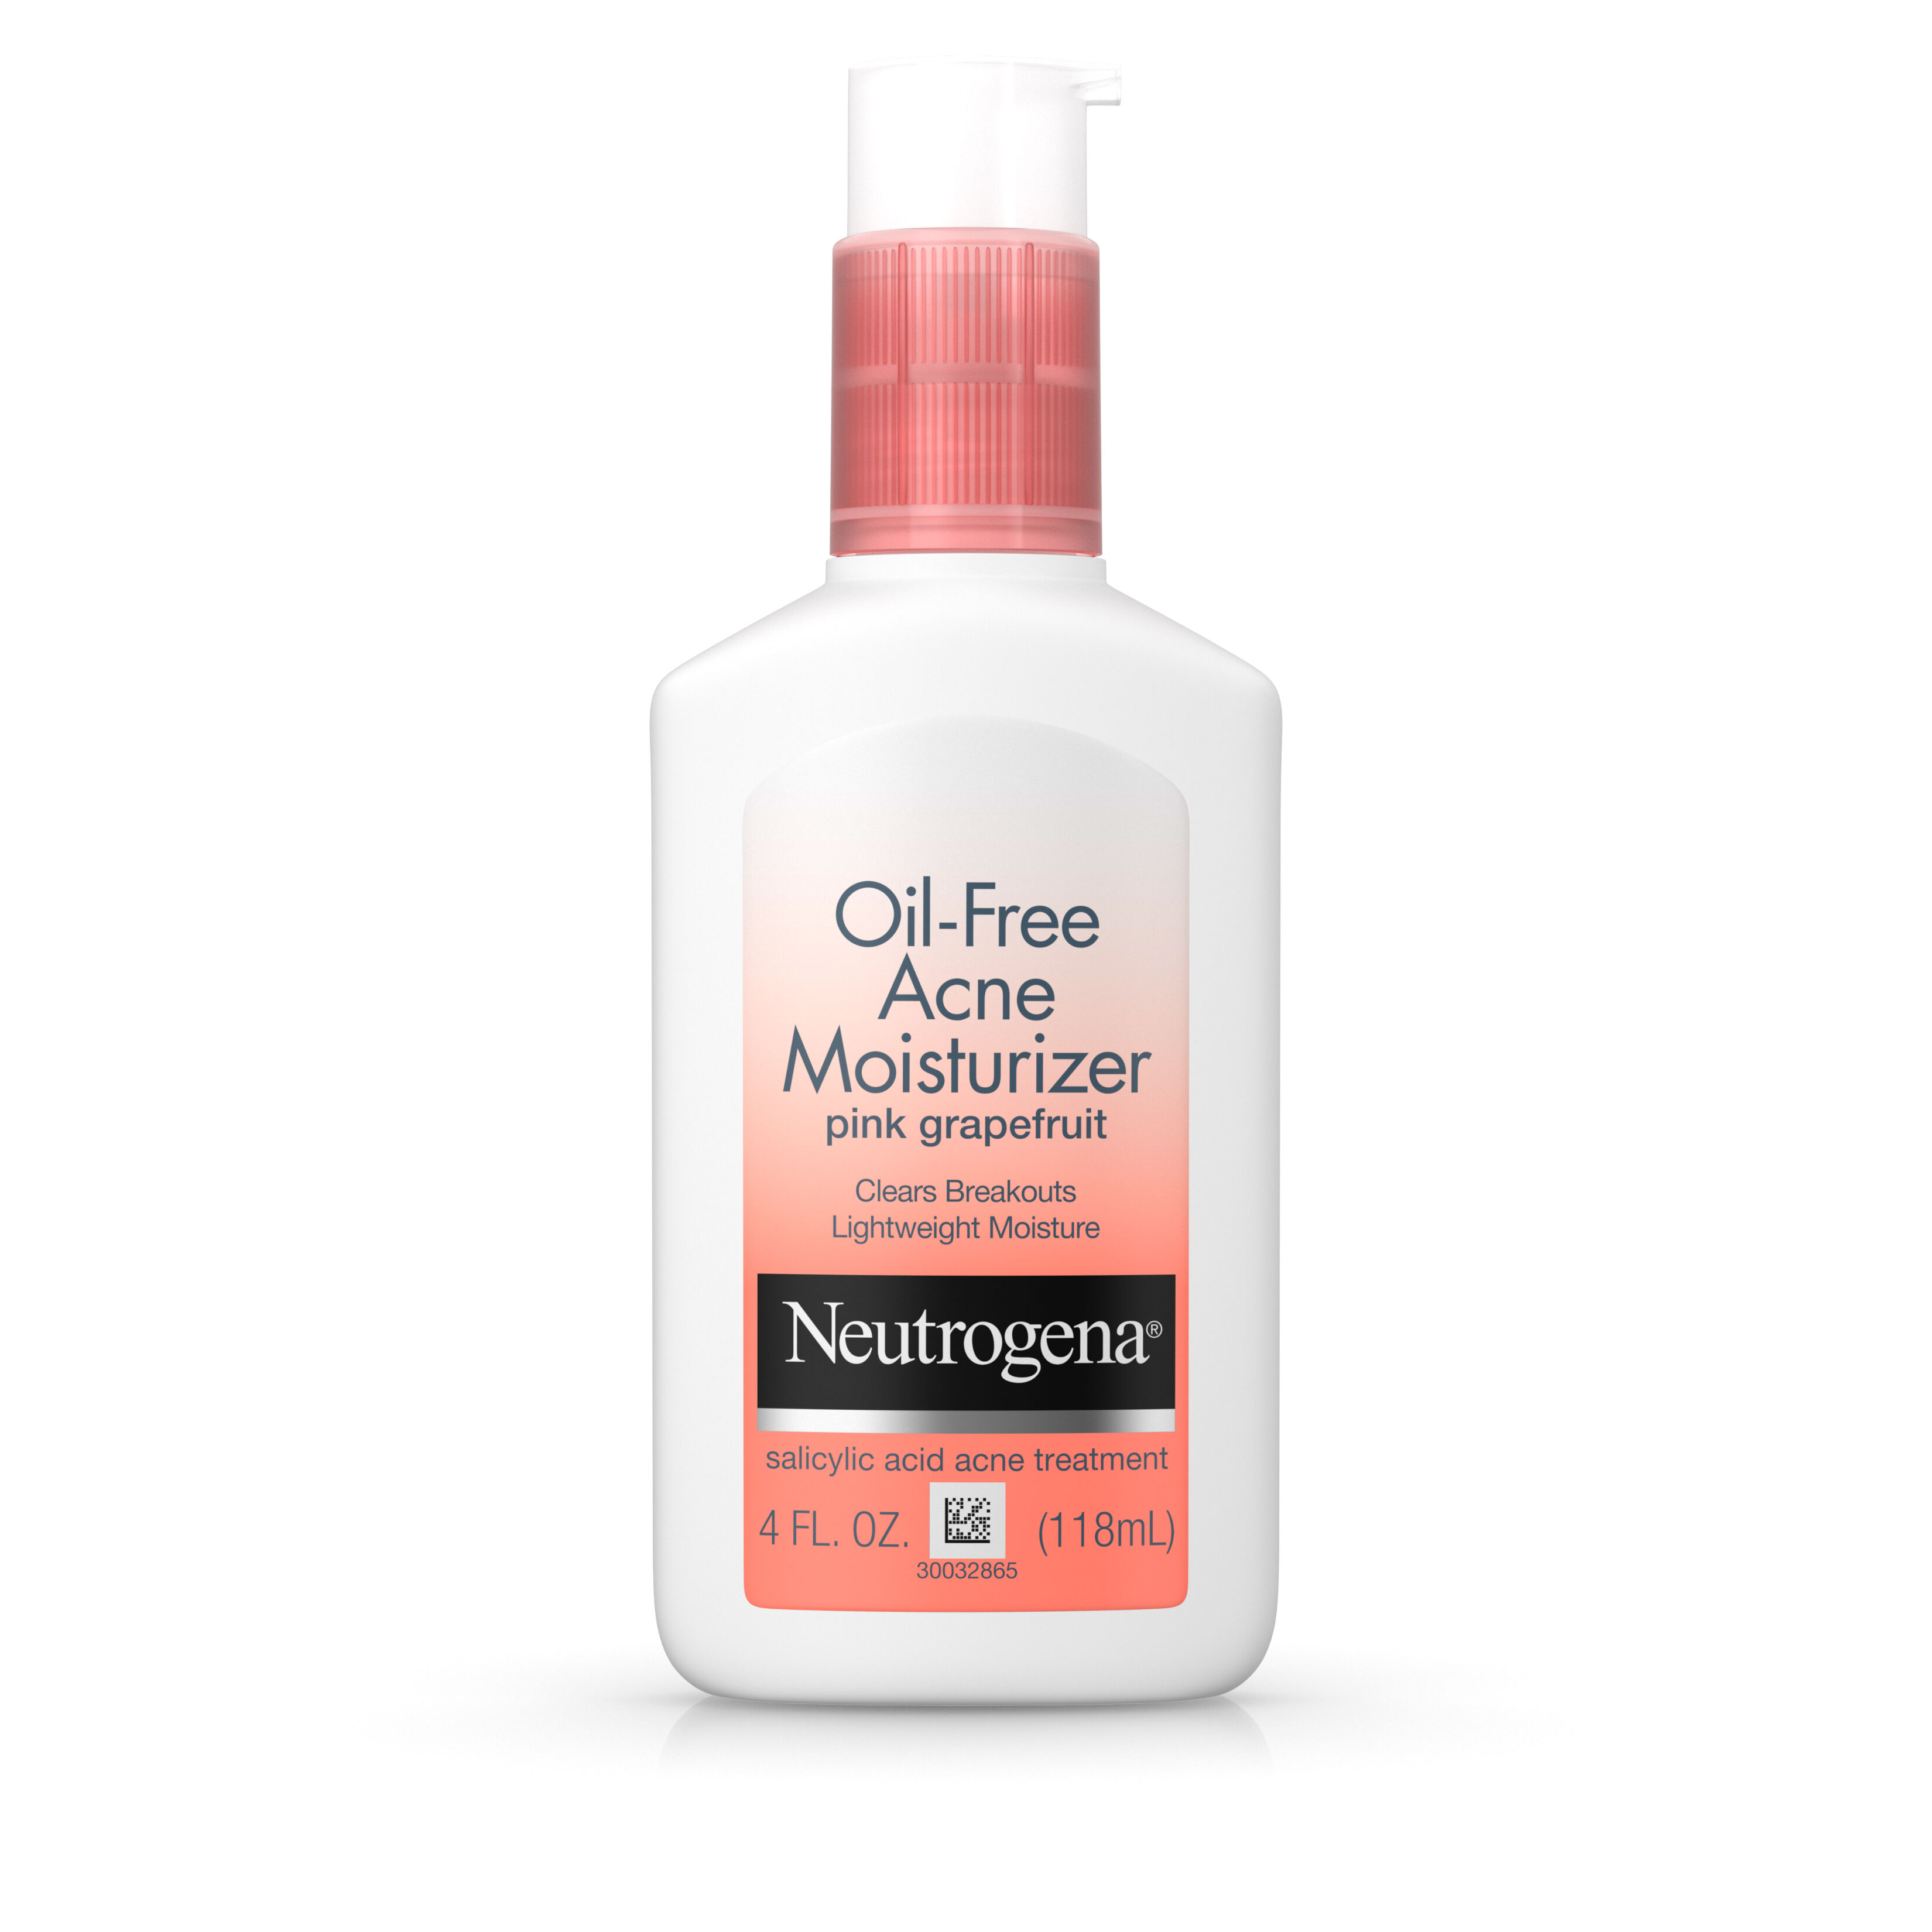 Image result for Oil-Free Acne Grapefruit Moisturizer